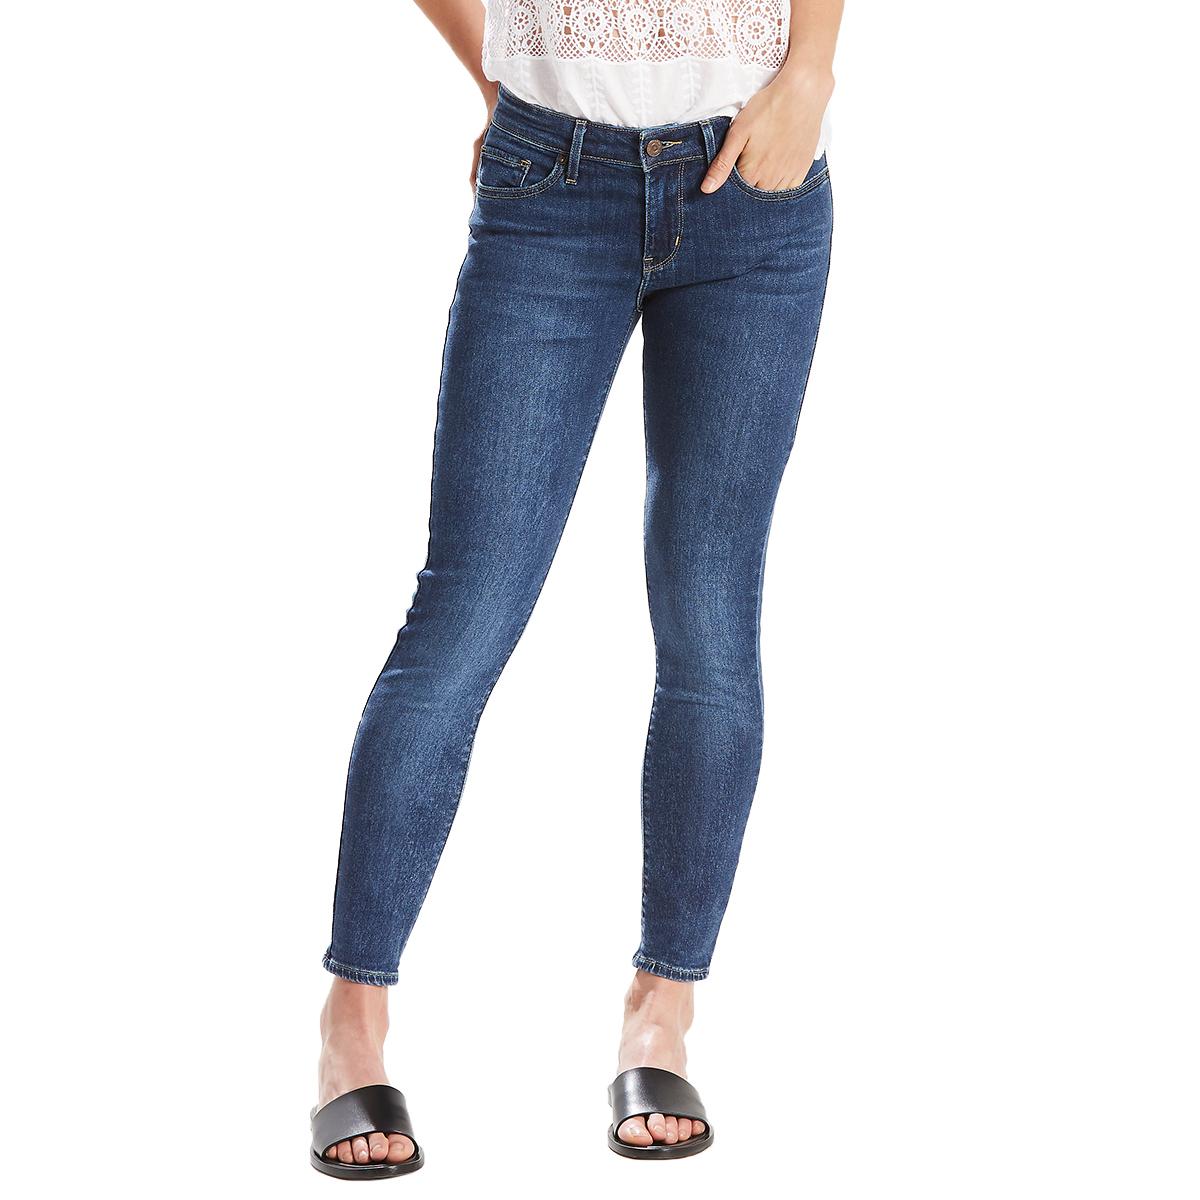 Levi's Women's 711 Skinny Ankle Jeans - Blue, 30